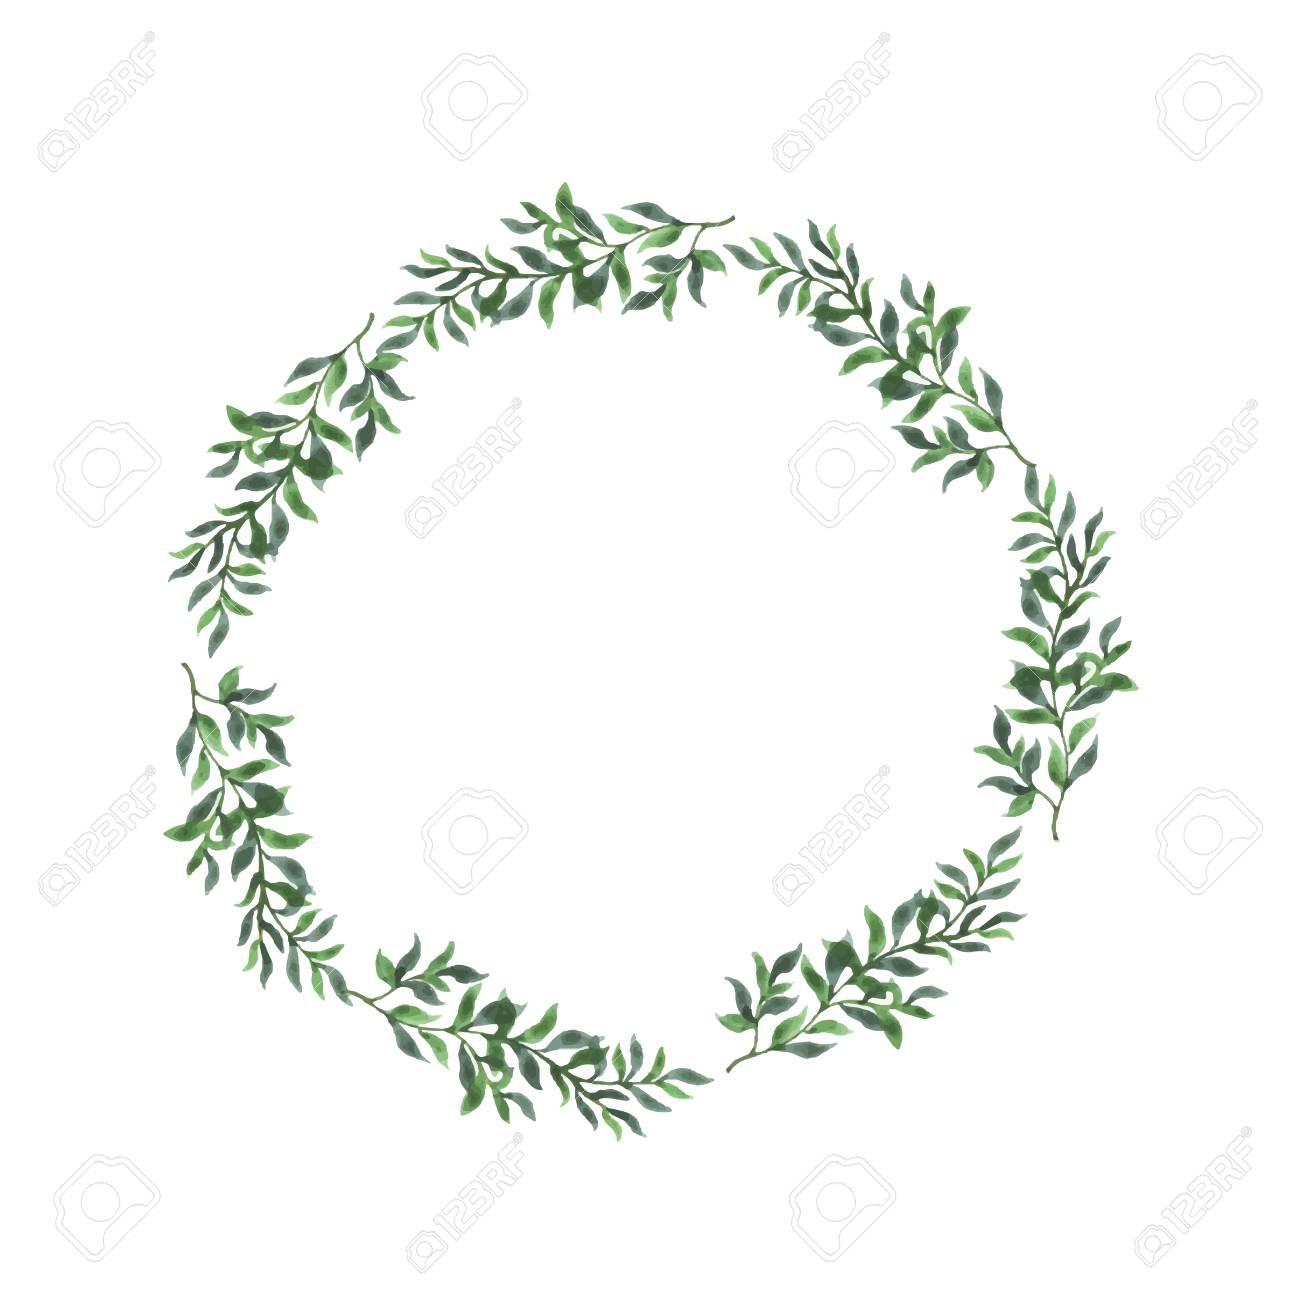 Abstract Green Leaf Laurel On White Background Design For Wedding